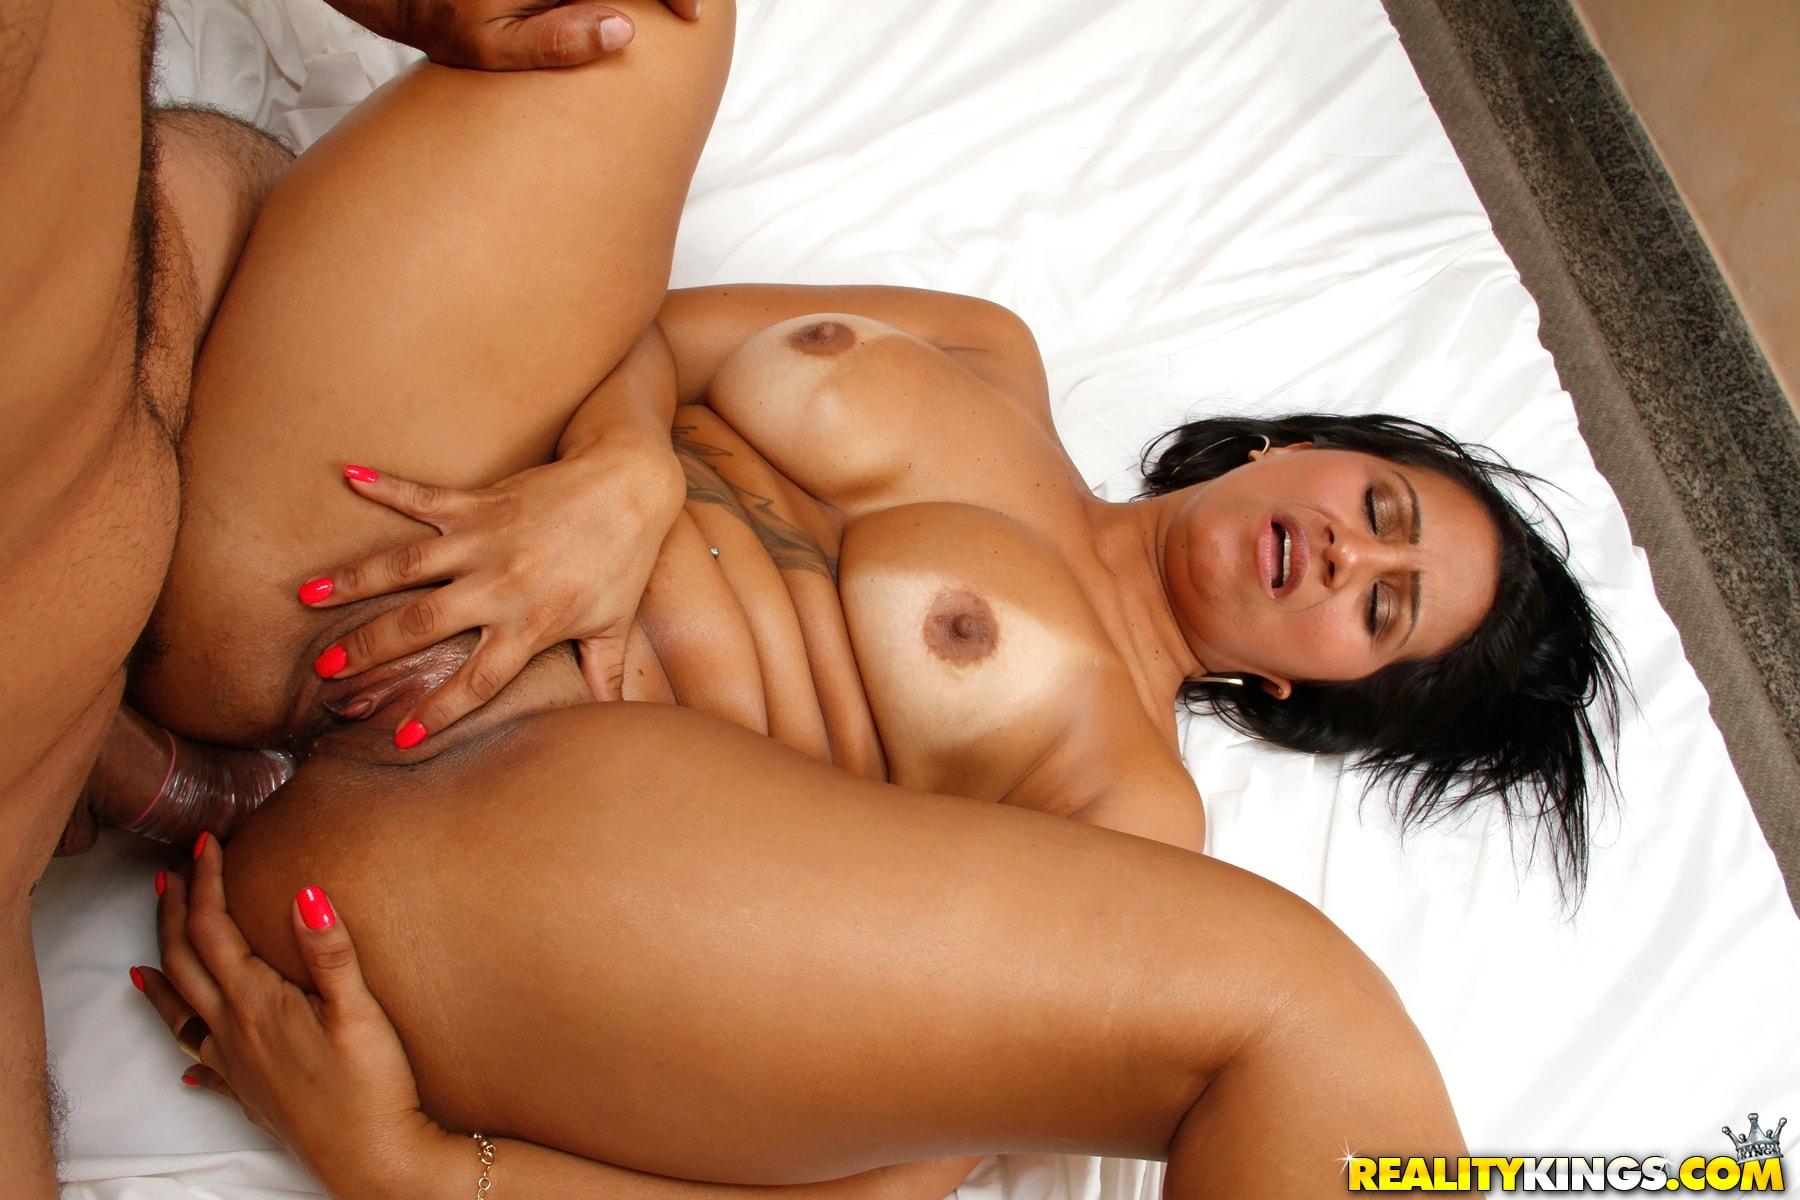 Fanny francois nude